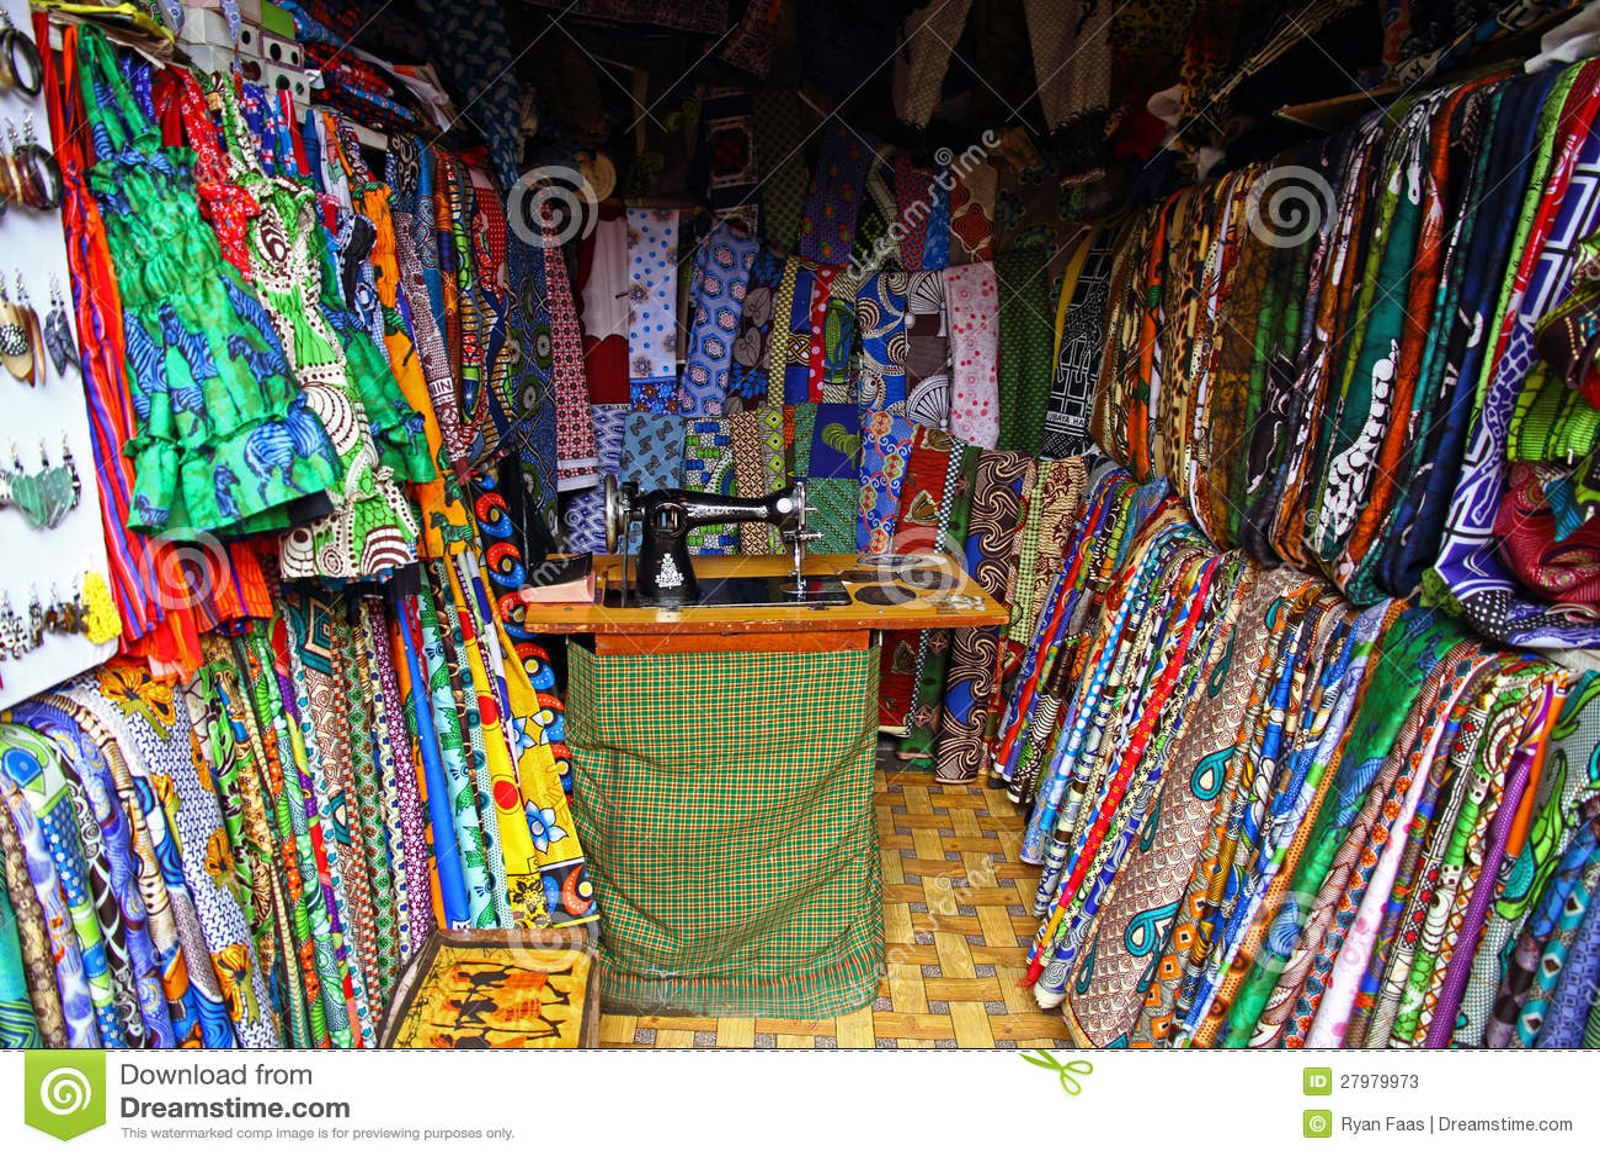 african fabric textile shop stock image image 27979973. Black Bedroom Furniture Sets. Home Design Ideas